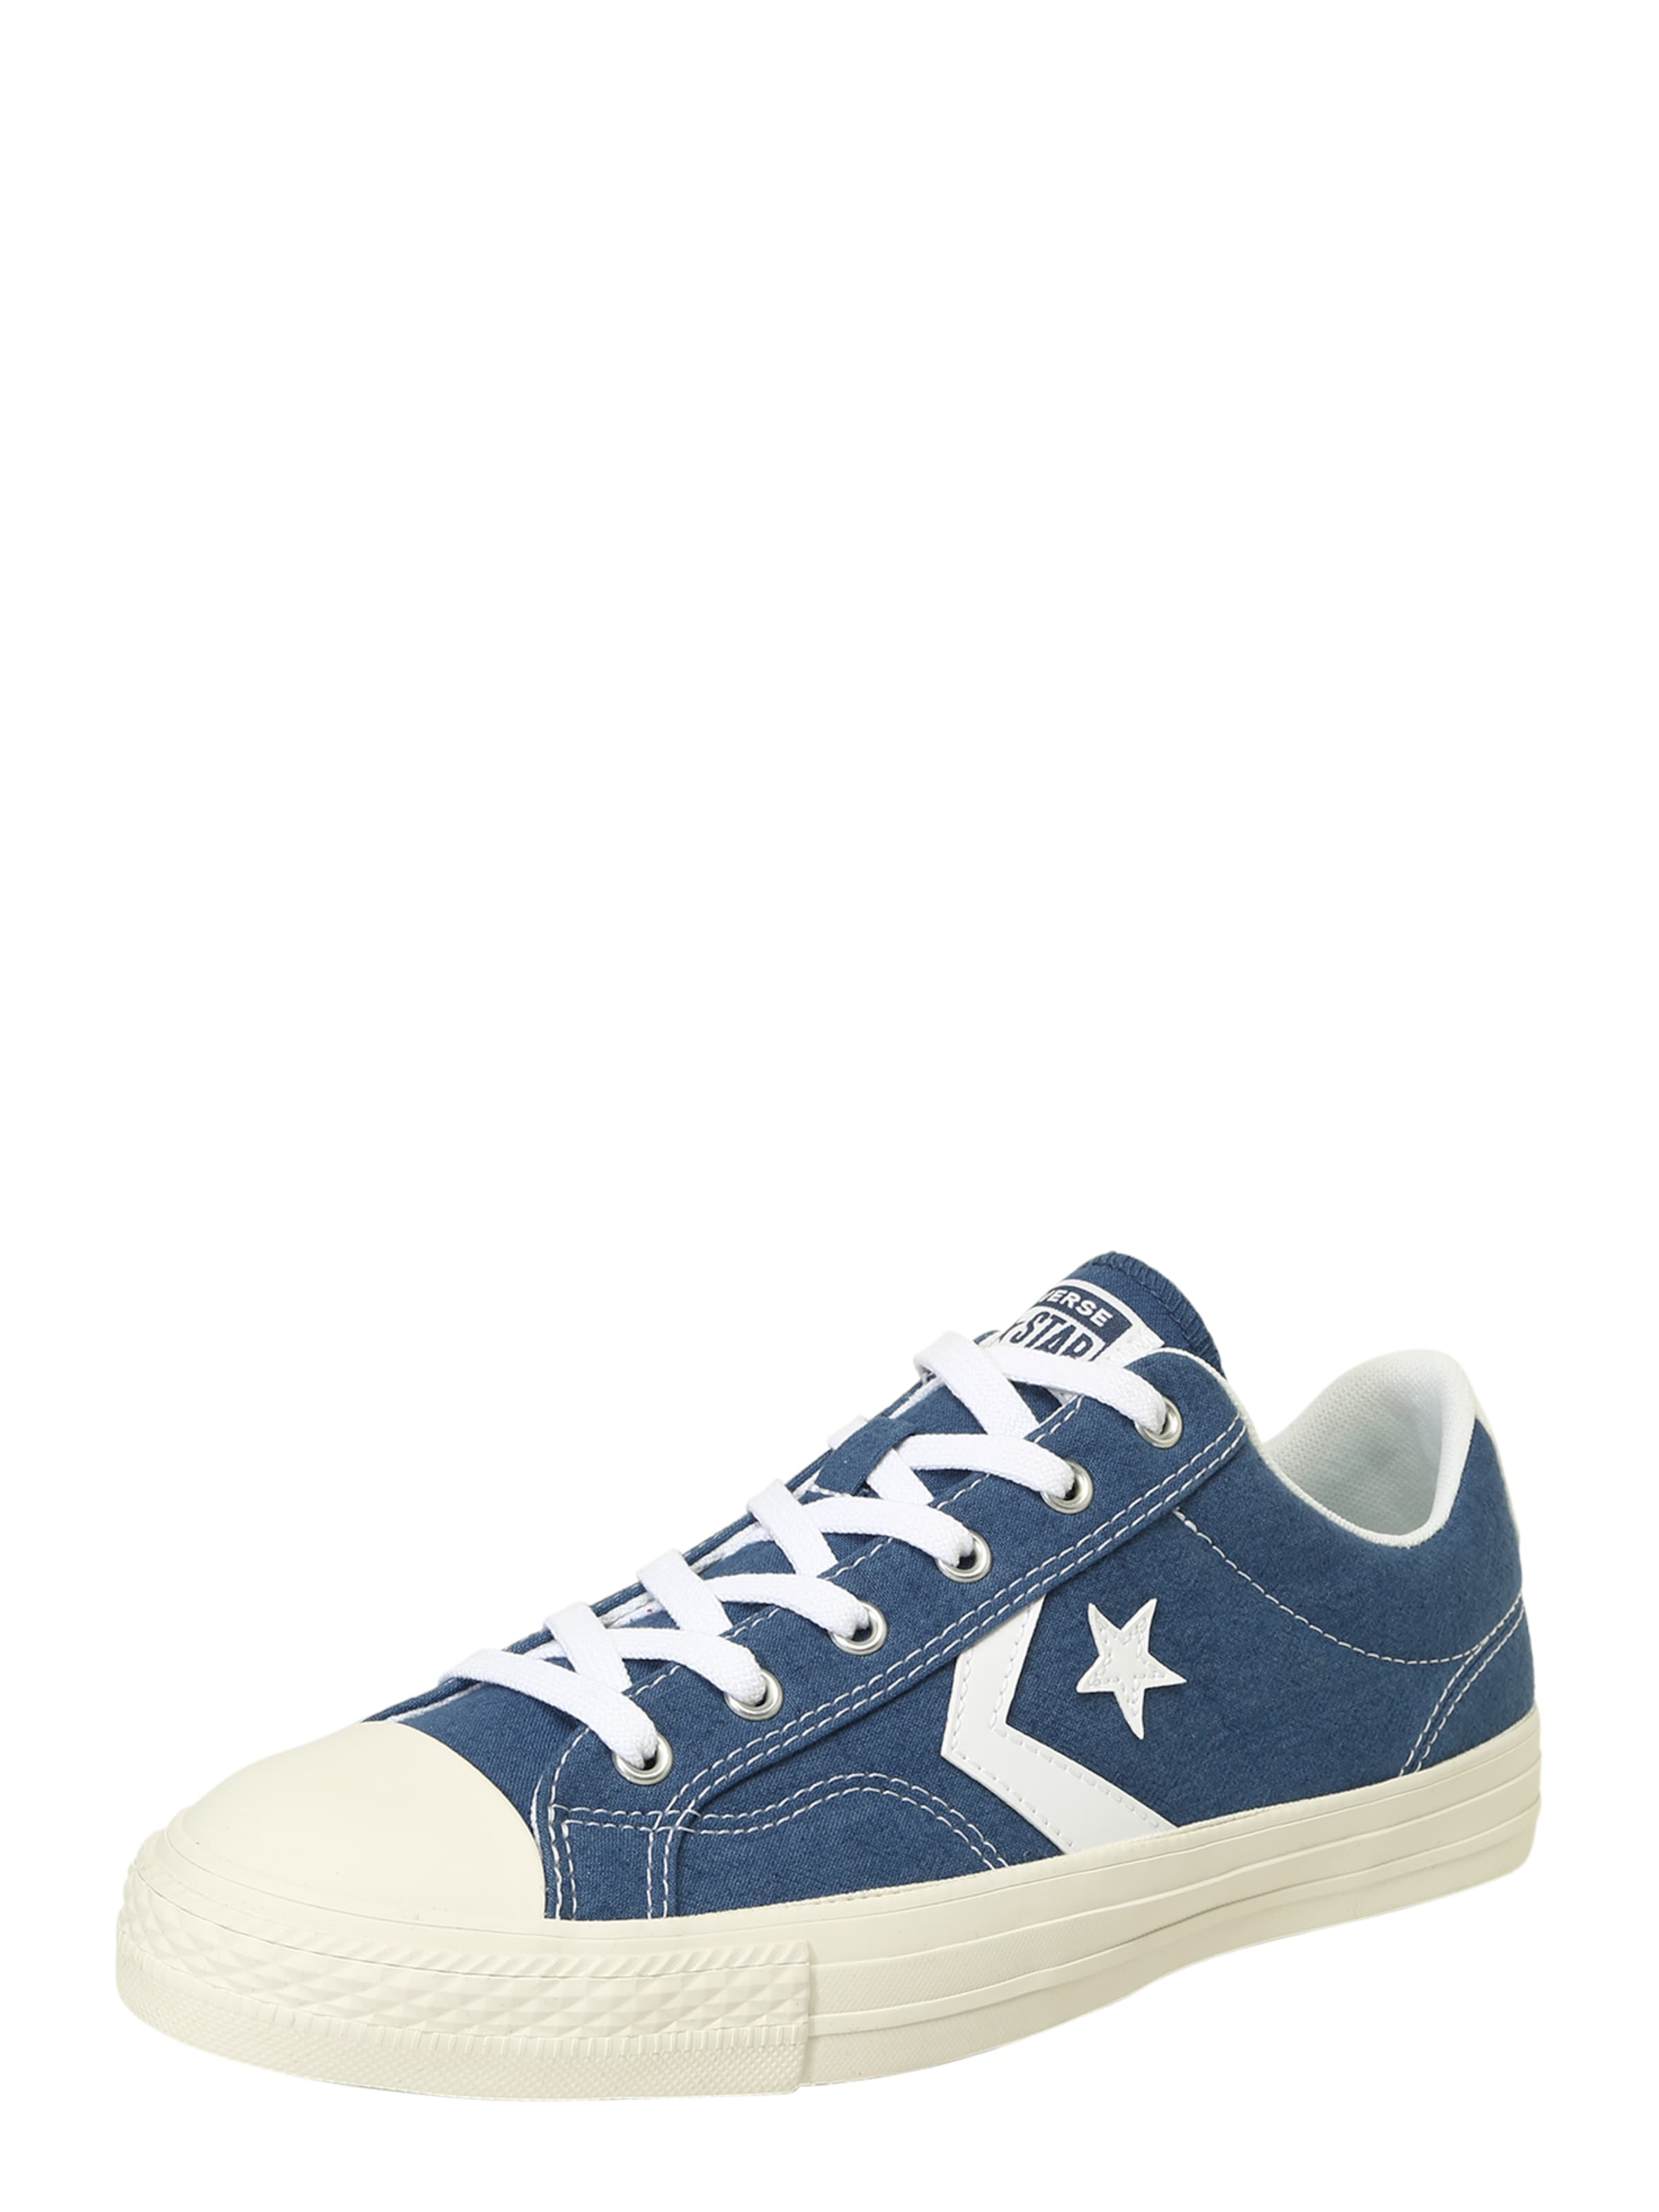 CONVERSE Sneaker Low  ONE STAR - OX